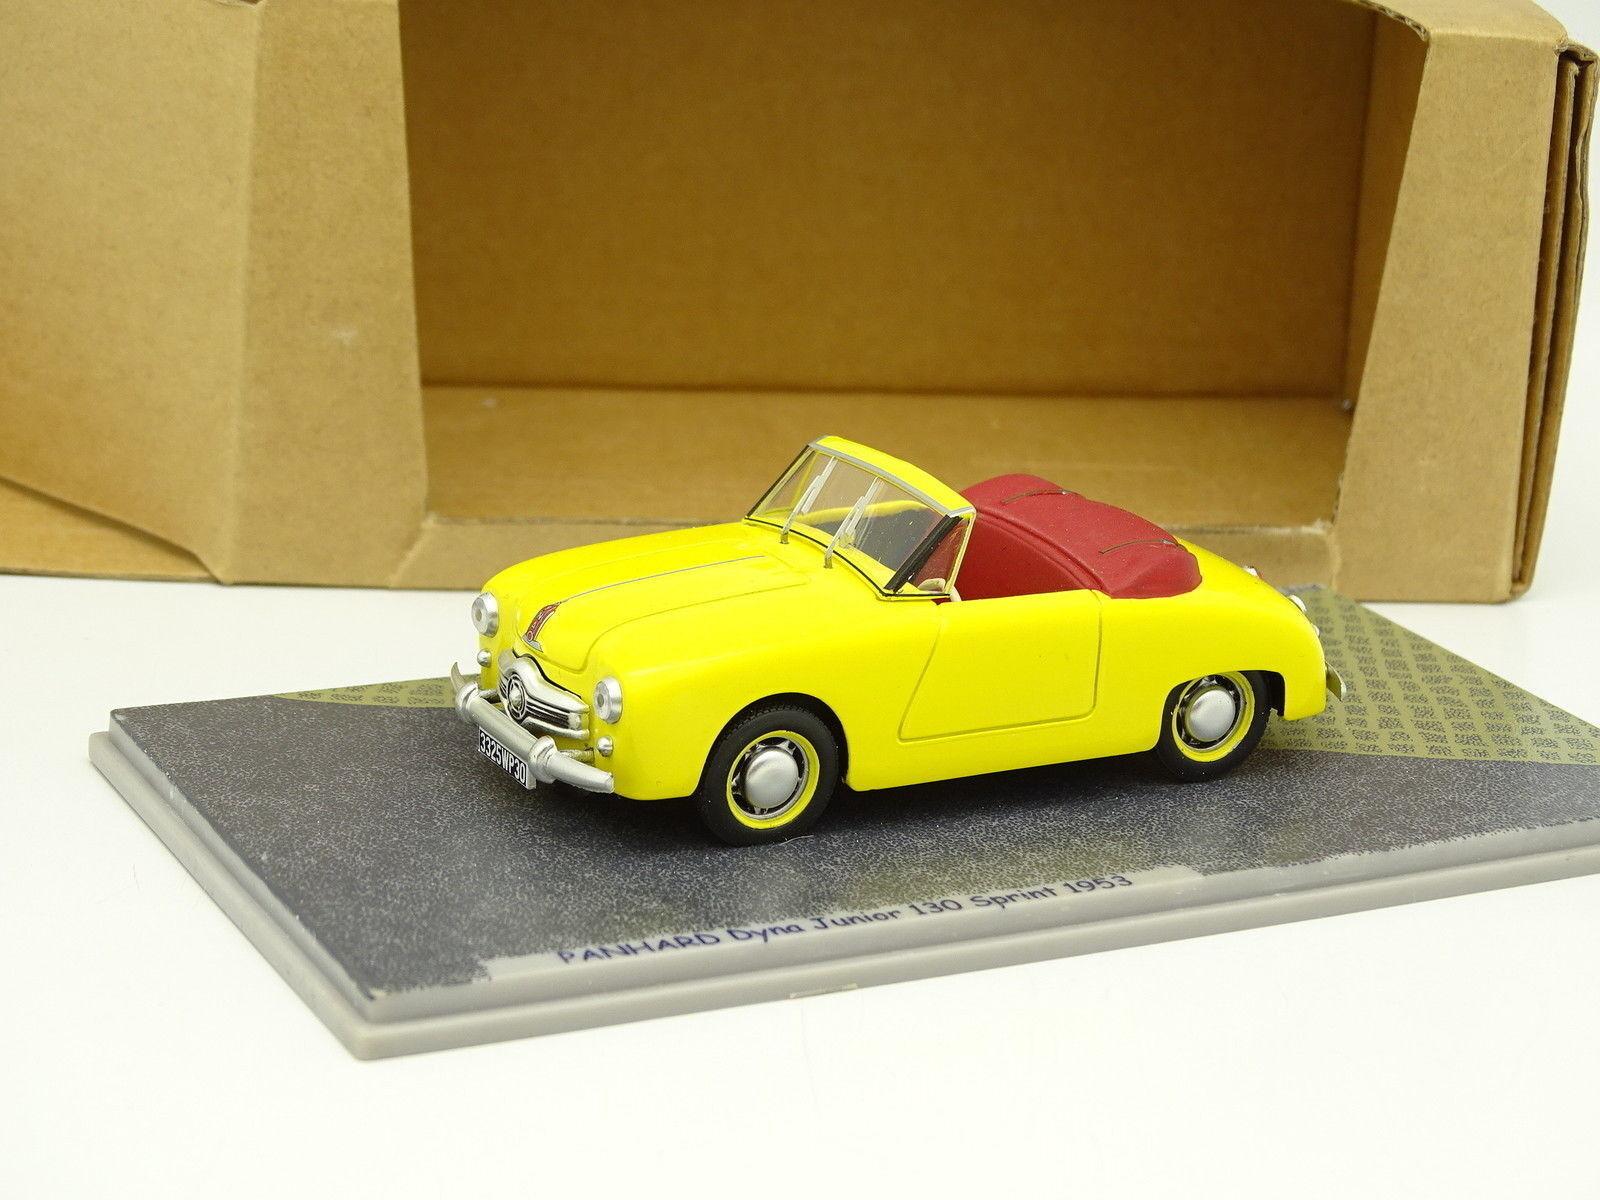 Bizarre Résine 1/43 - Panhard Dyna Junior 130 Sprint 1953 Jaune | économie